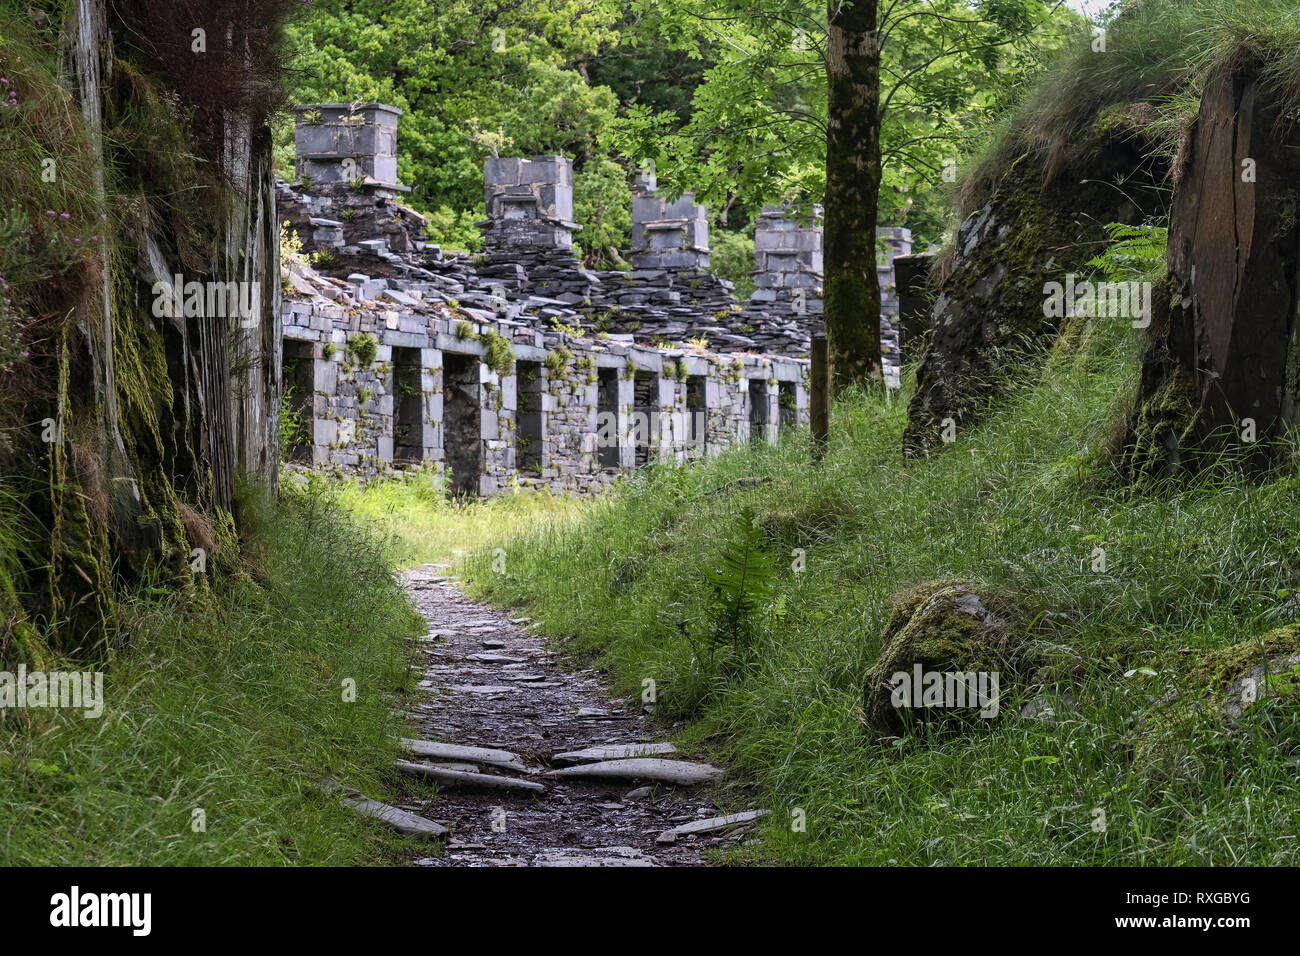 Anglesey Barracks, The Quarrymans Path, Dinorwic Quarry, Snowdonia National Park, North Wales, UK - Stock Image